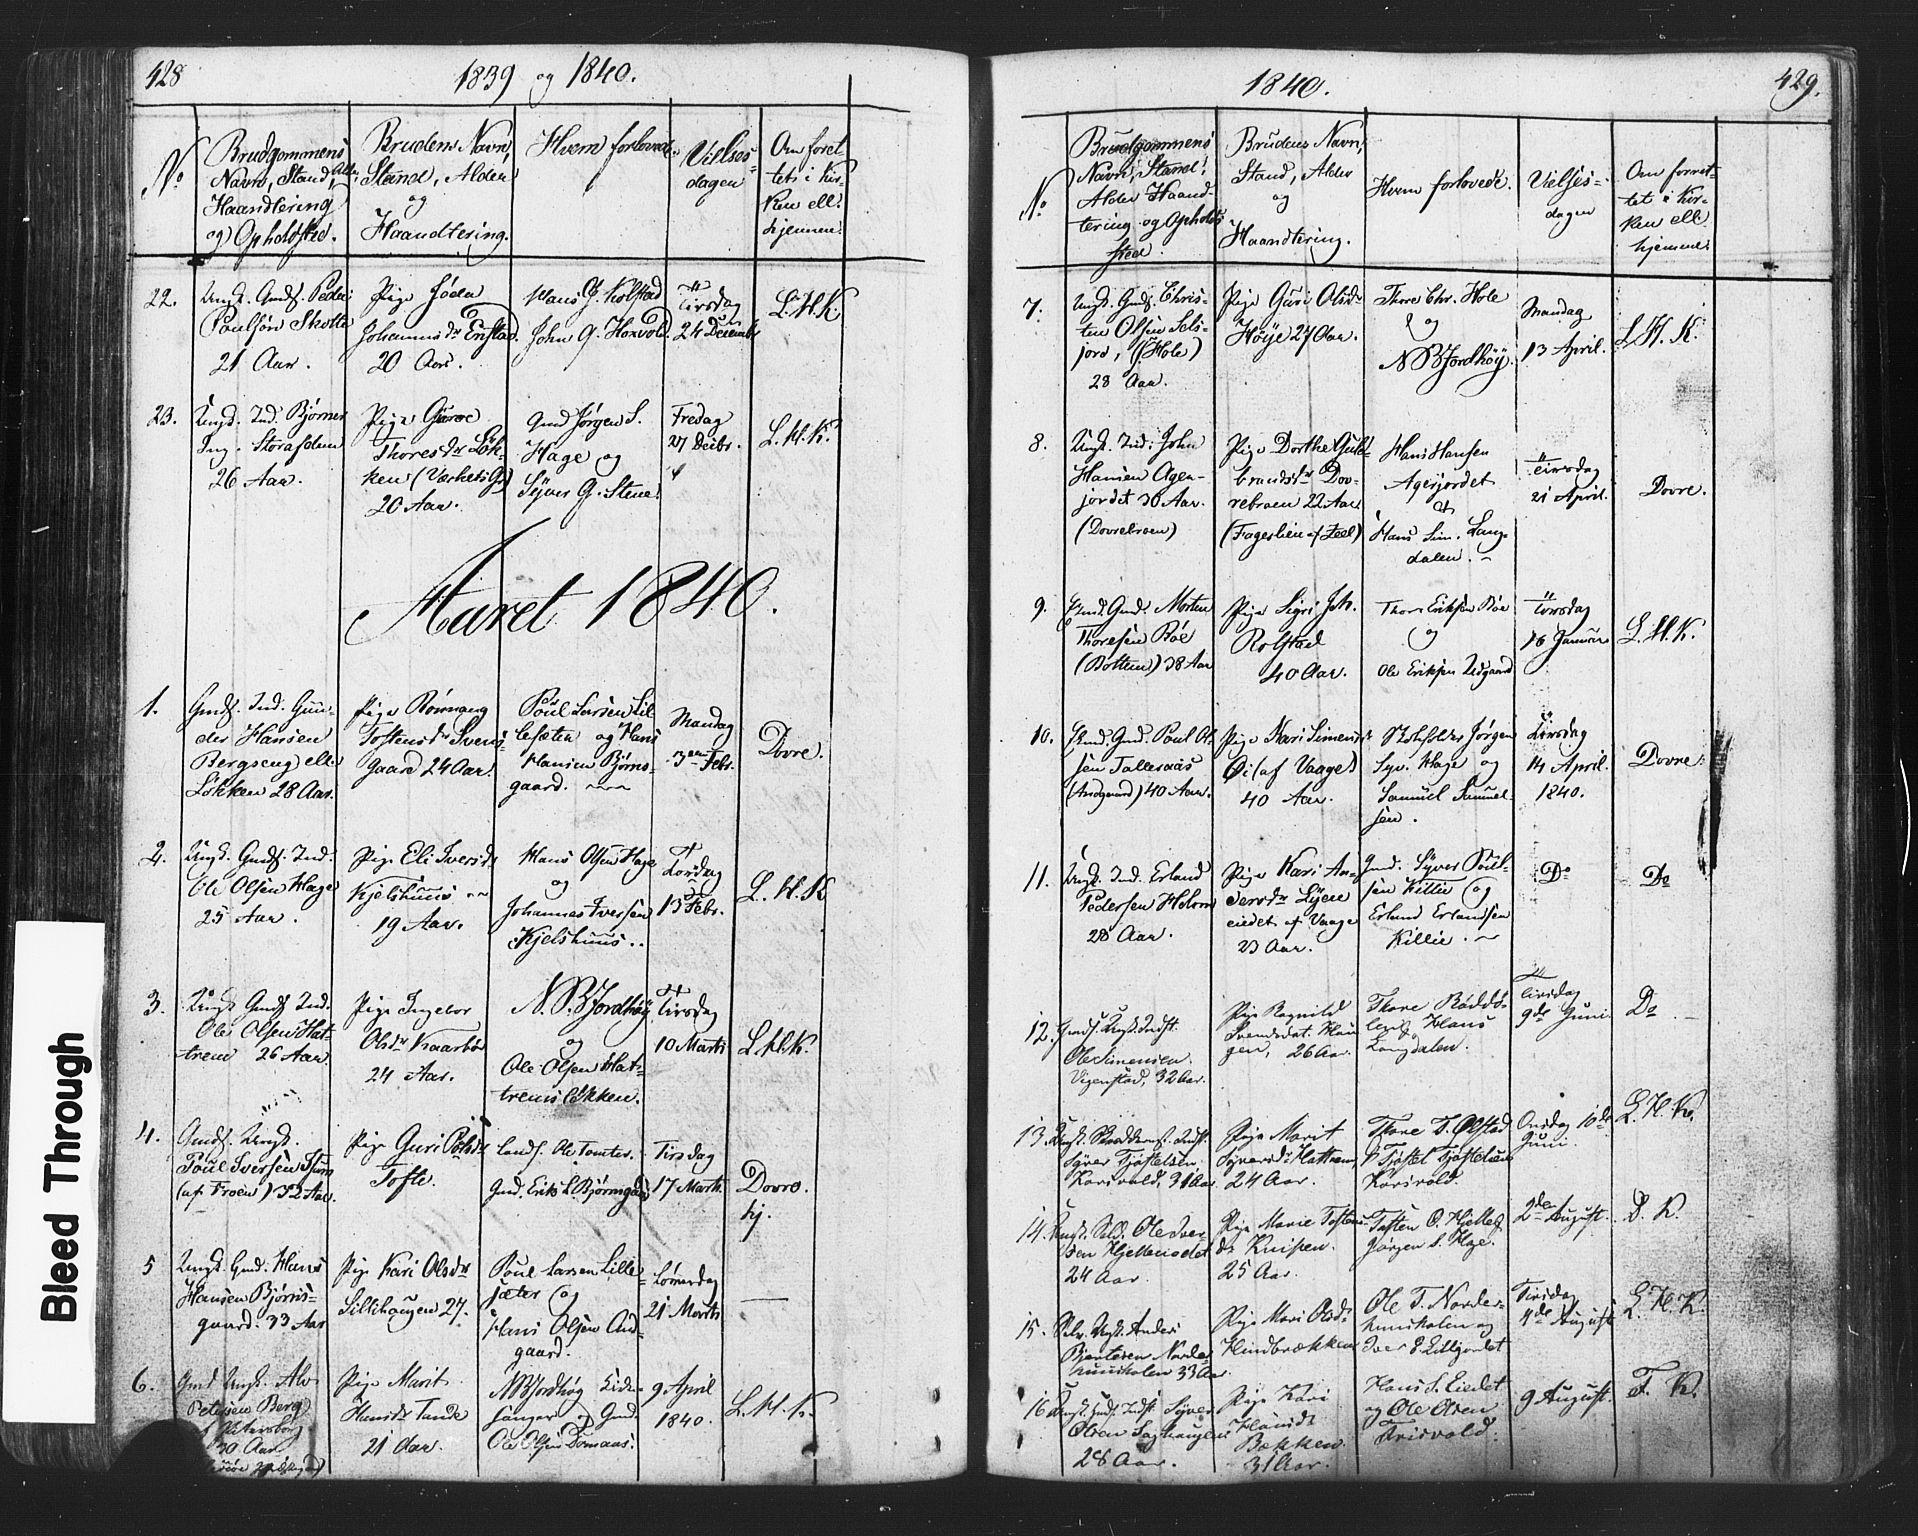 SAH, Lesja prestekontor, Klokkerbok nr. 2, 1832-1850, s. 428-429